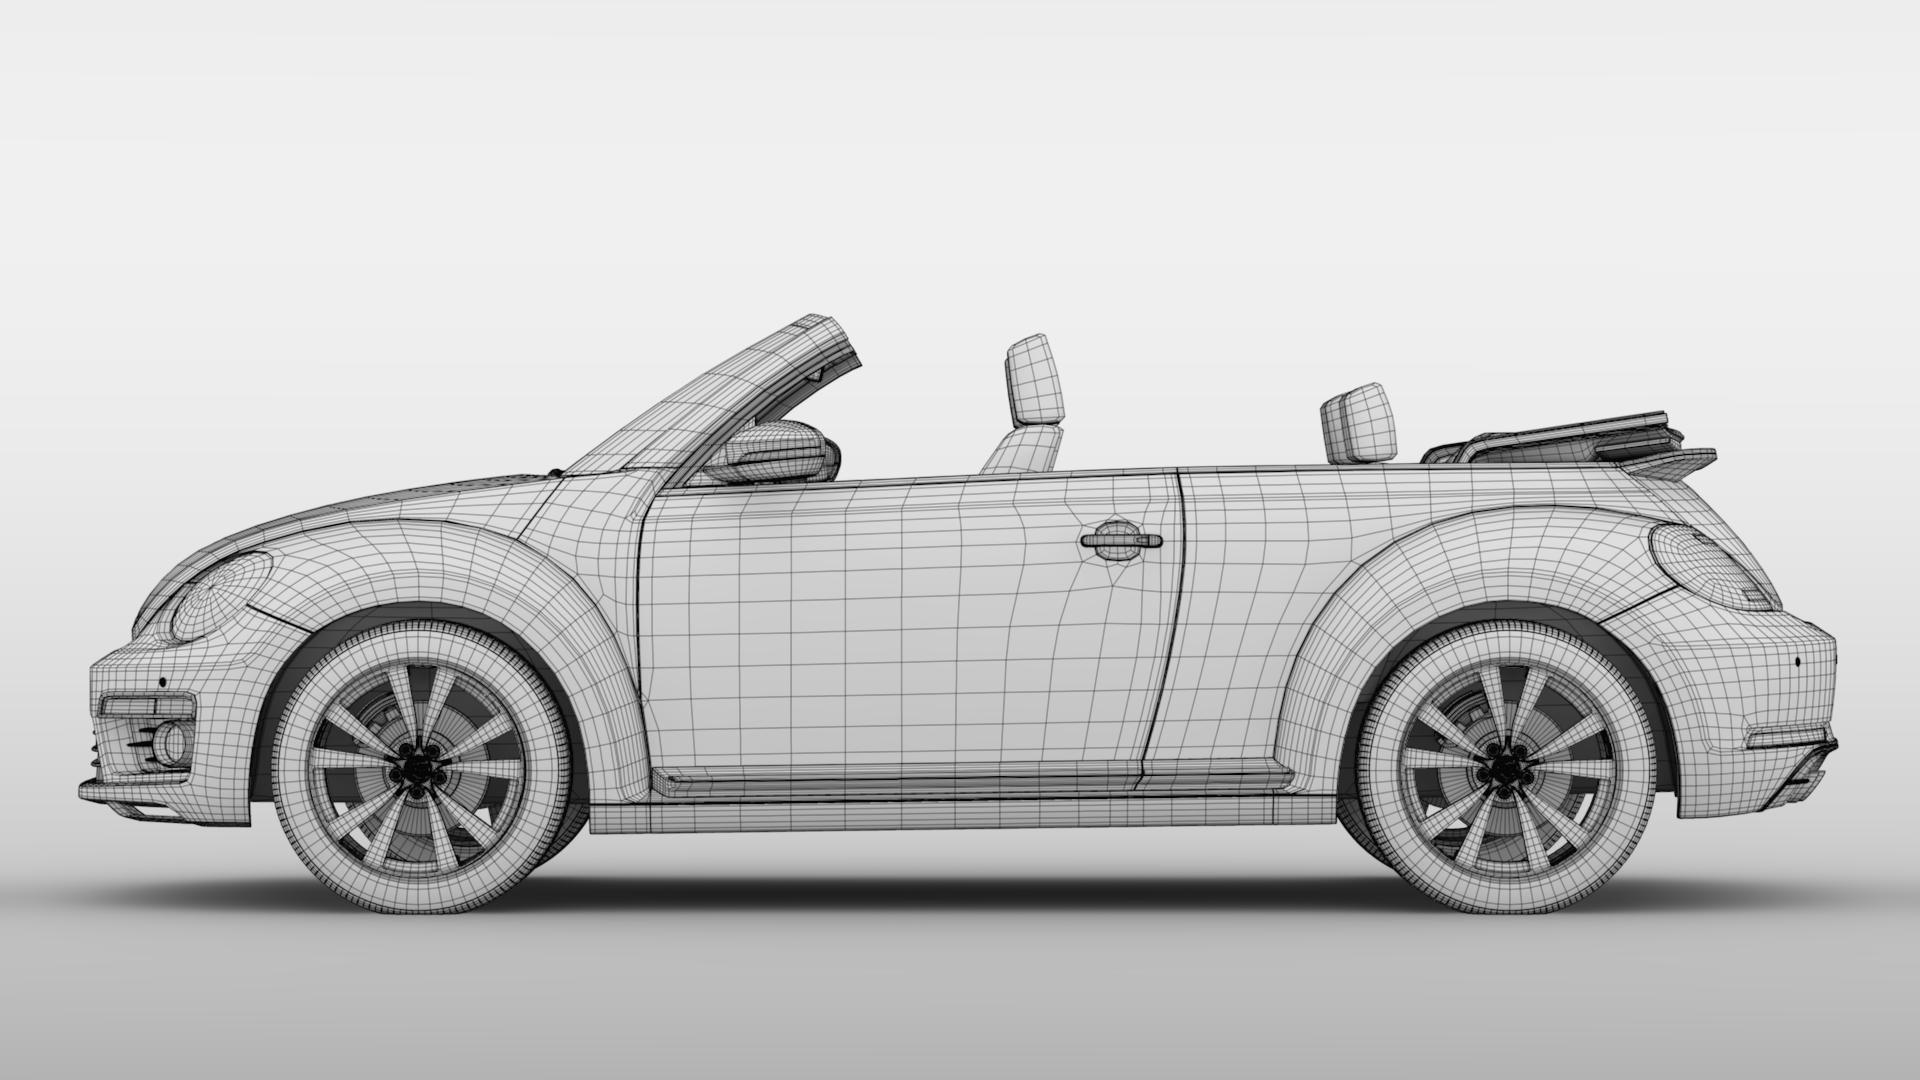 vw beetle cabriolet 2017 3d model 3ds max fbx c4d lwo ma mb hrc xsi obj 221610